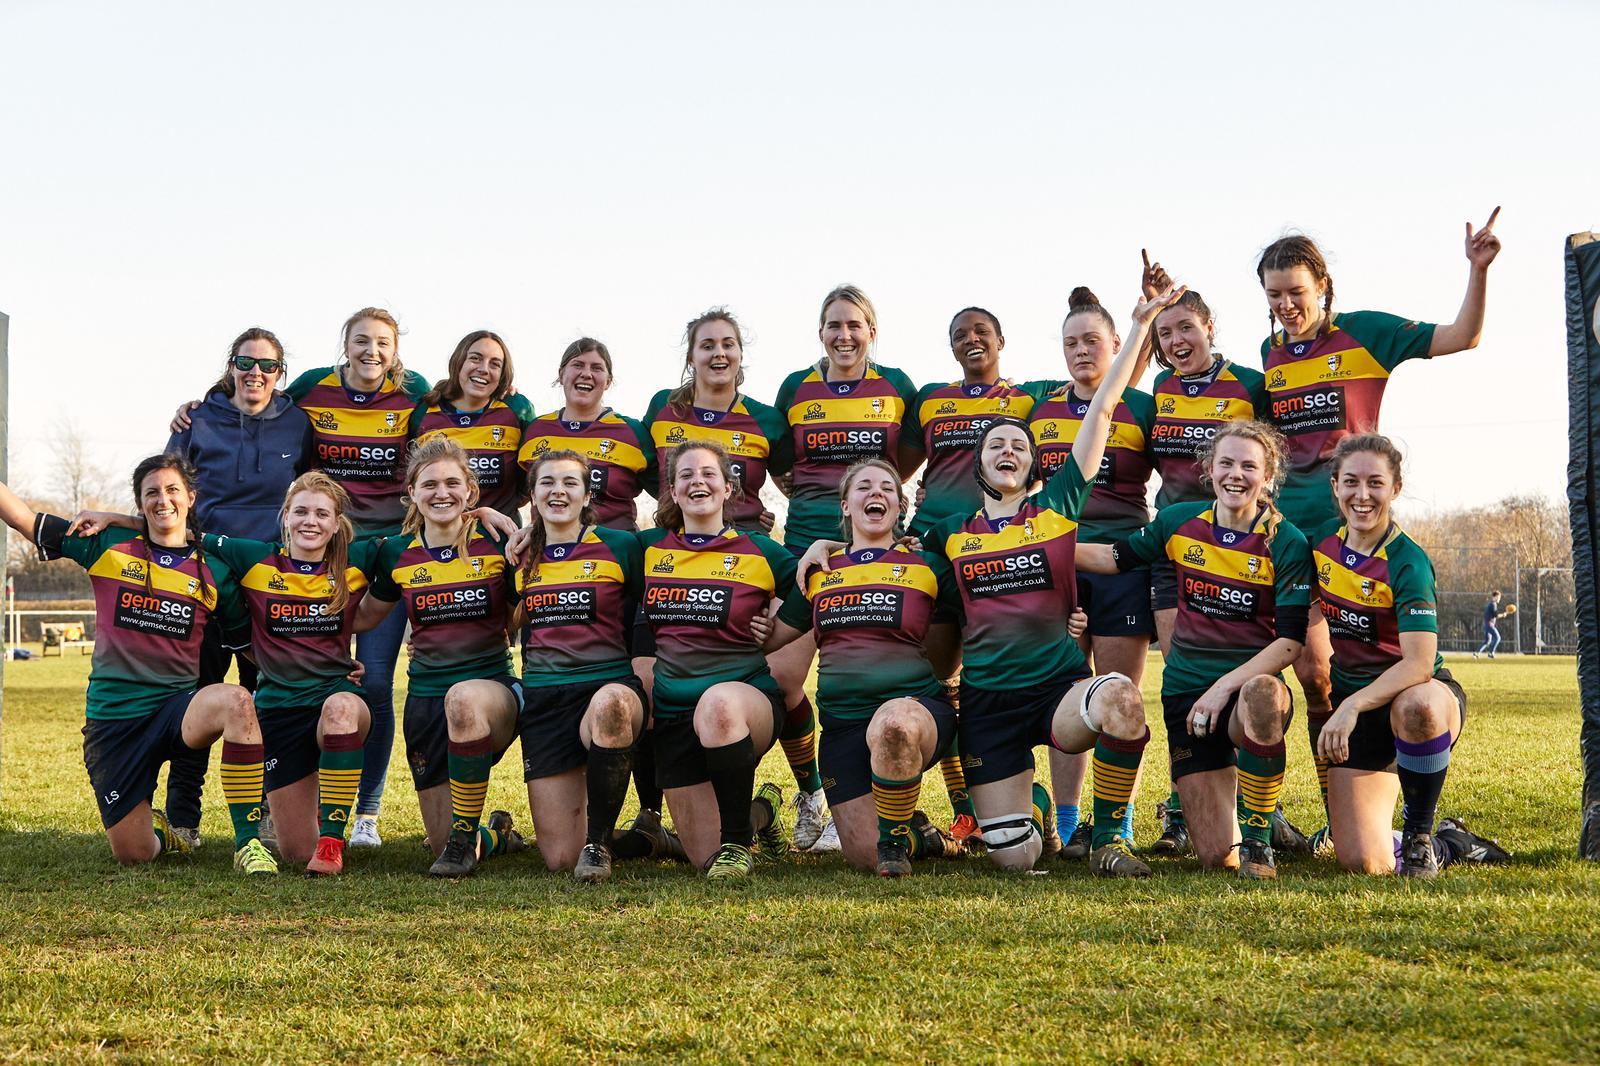 5b2f3f232e0 Minehead Barbarians Ladies 29 vs. 27 Old Bristolians Ladies - 12 ...